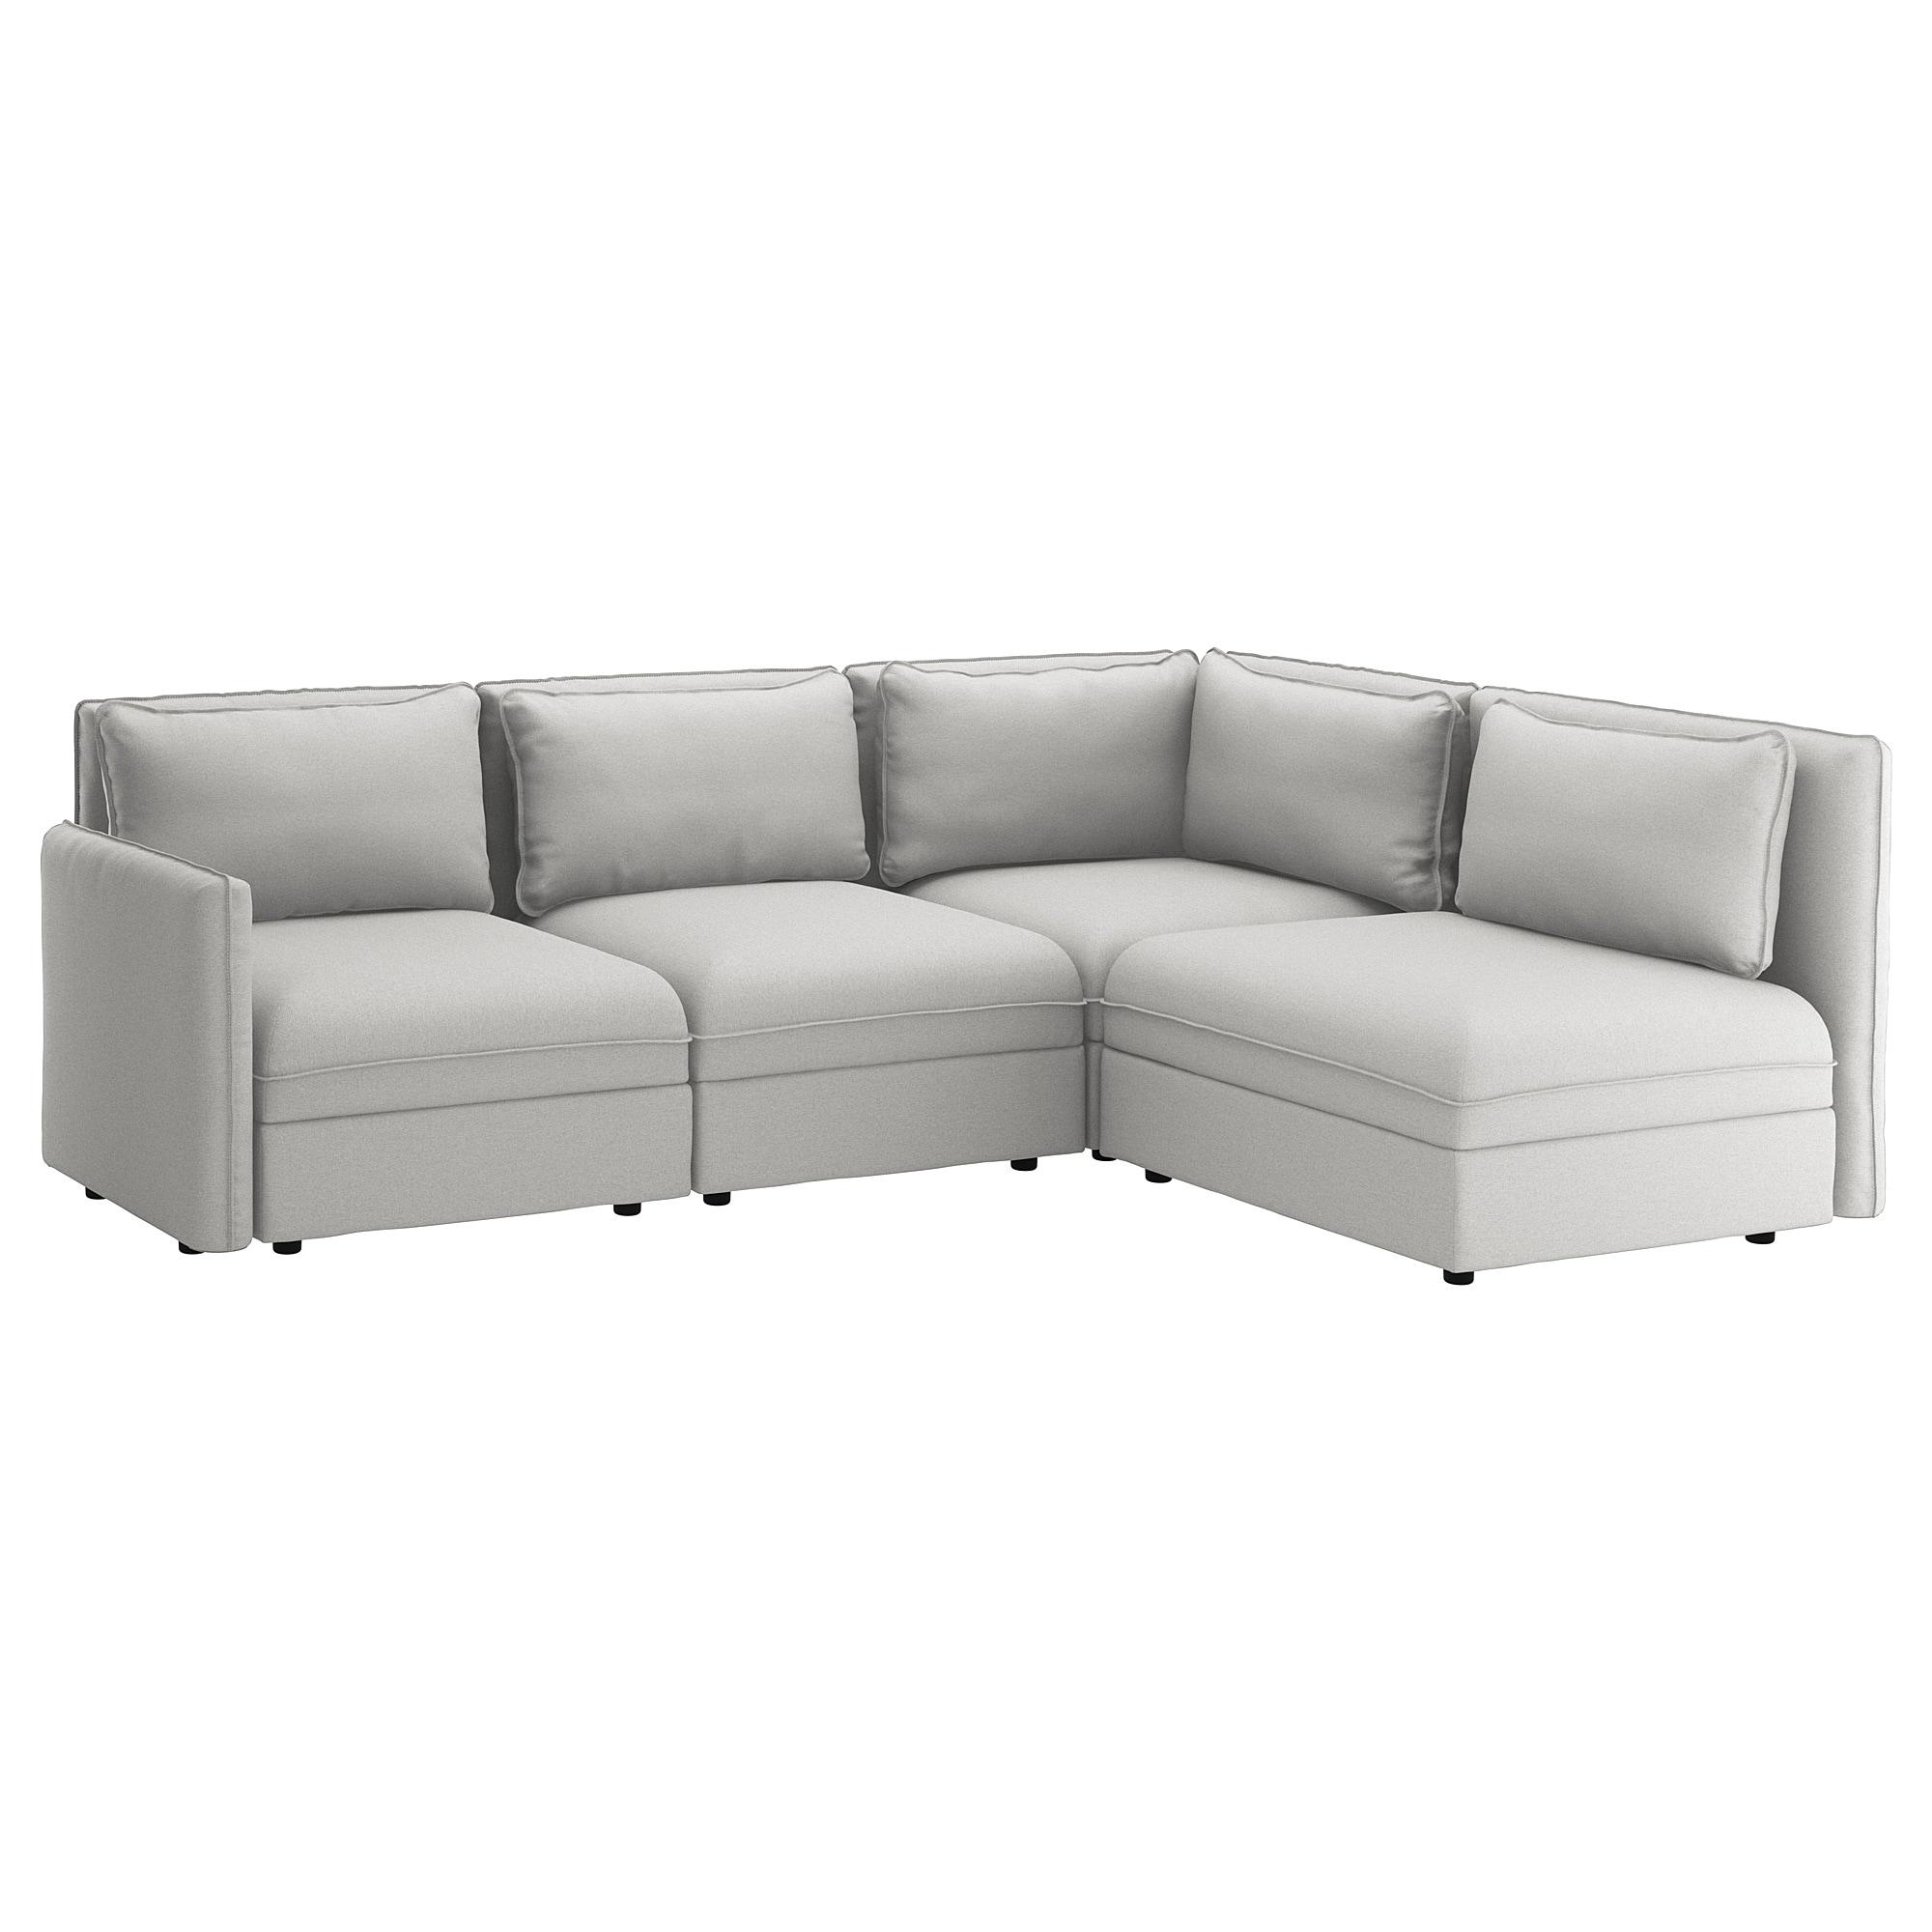 Sofa Modular Ipdd Vallentuna Modular Corner sofa 3 Seat with Storage orrsta Light